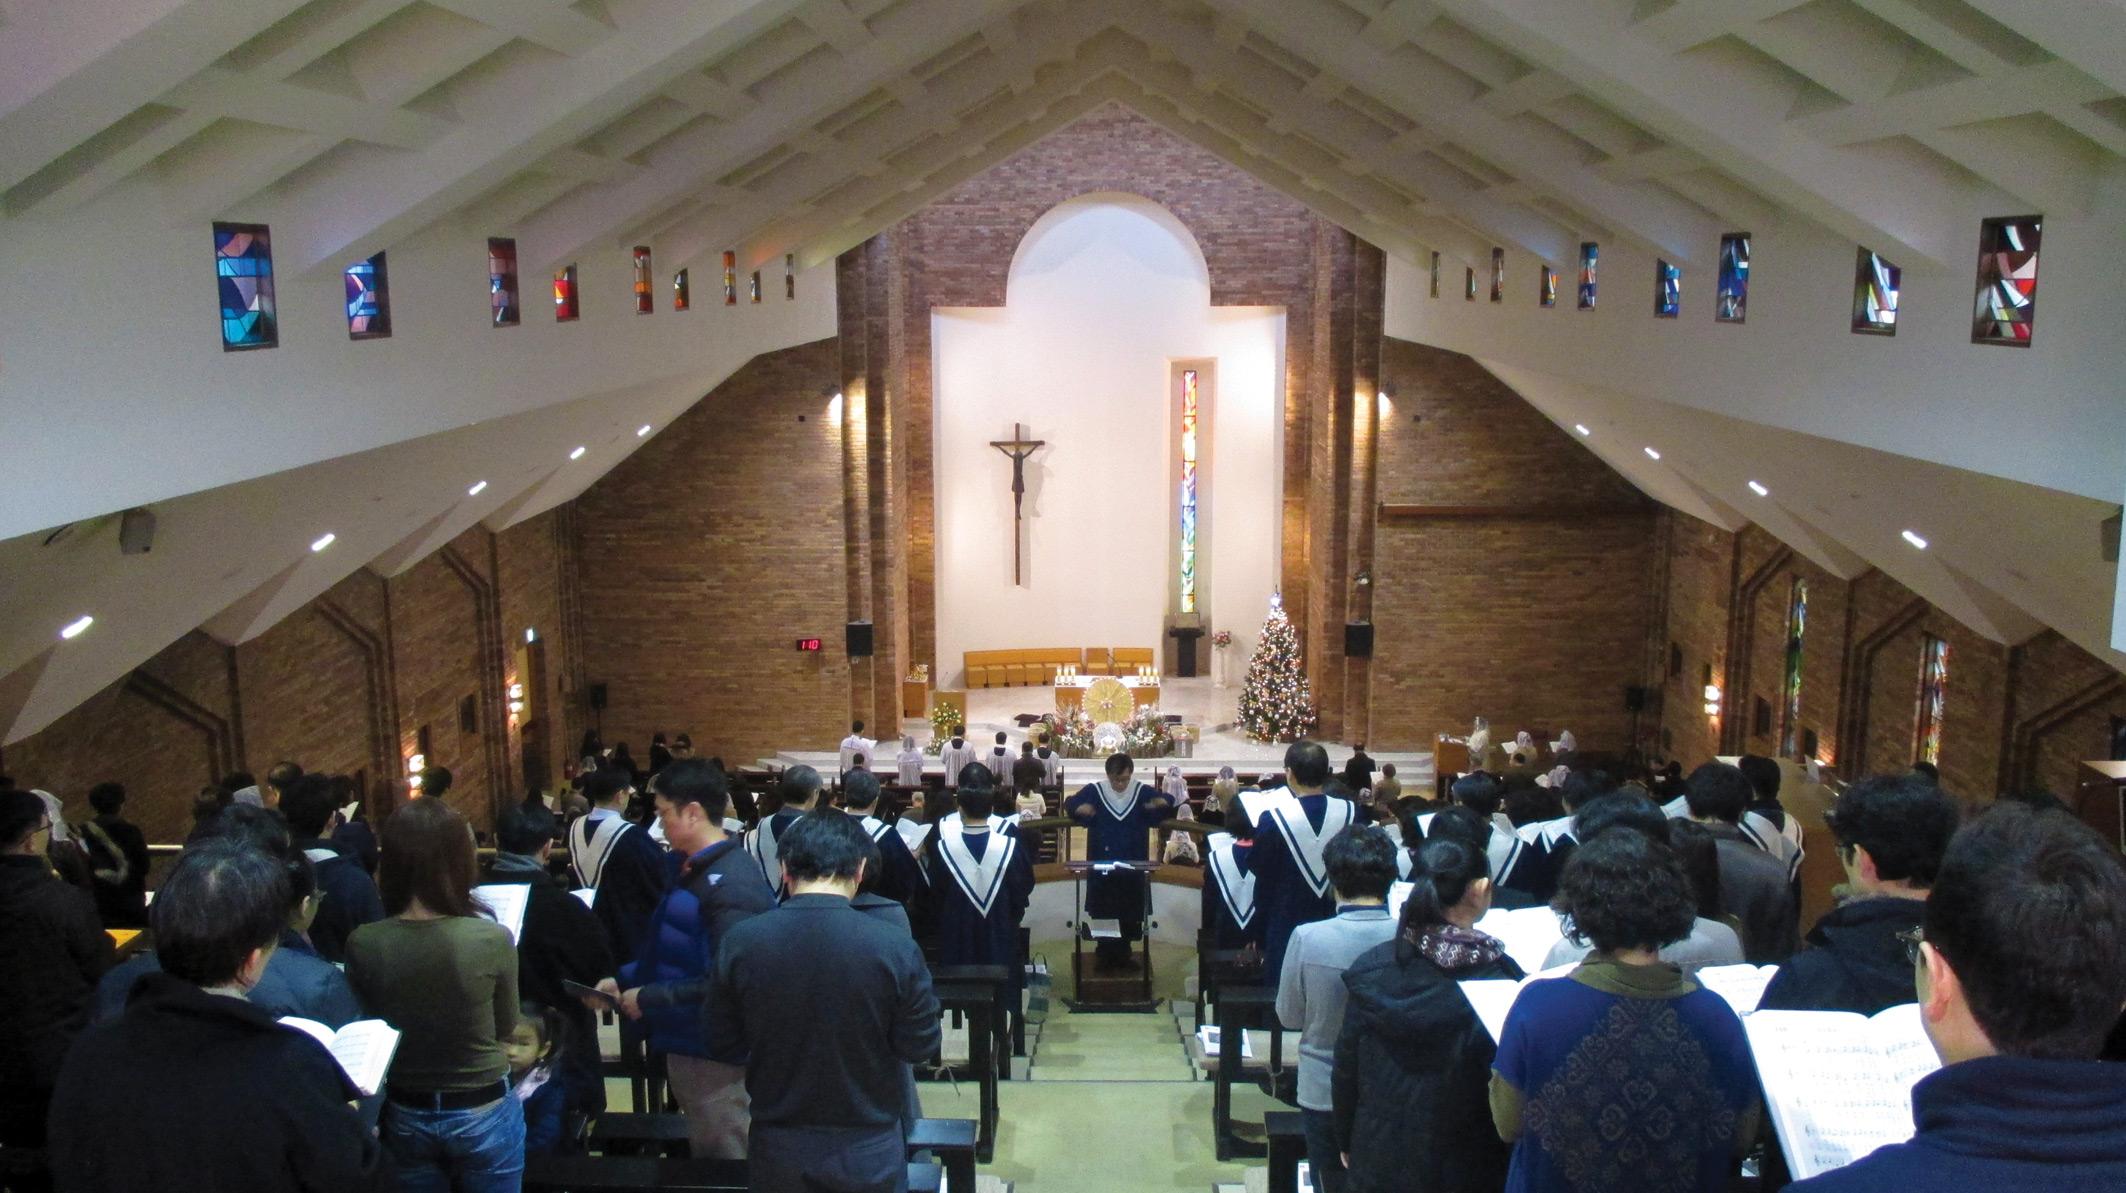 Mass in the church in Seoul South